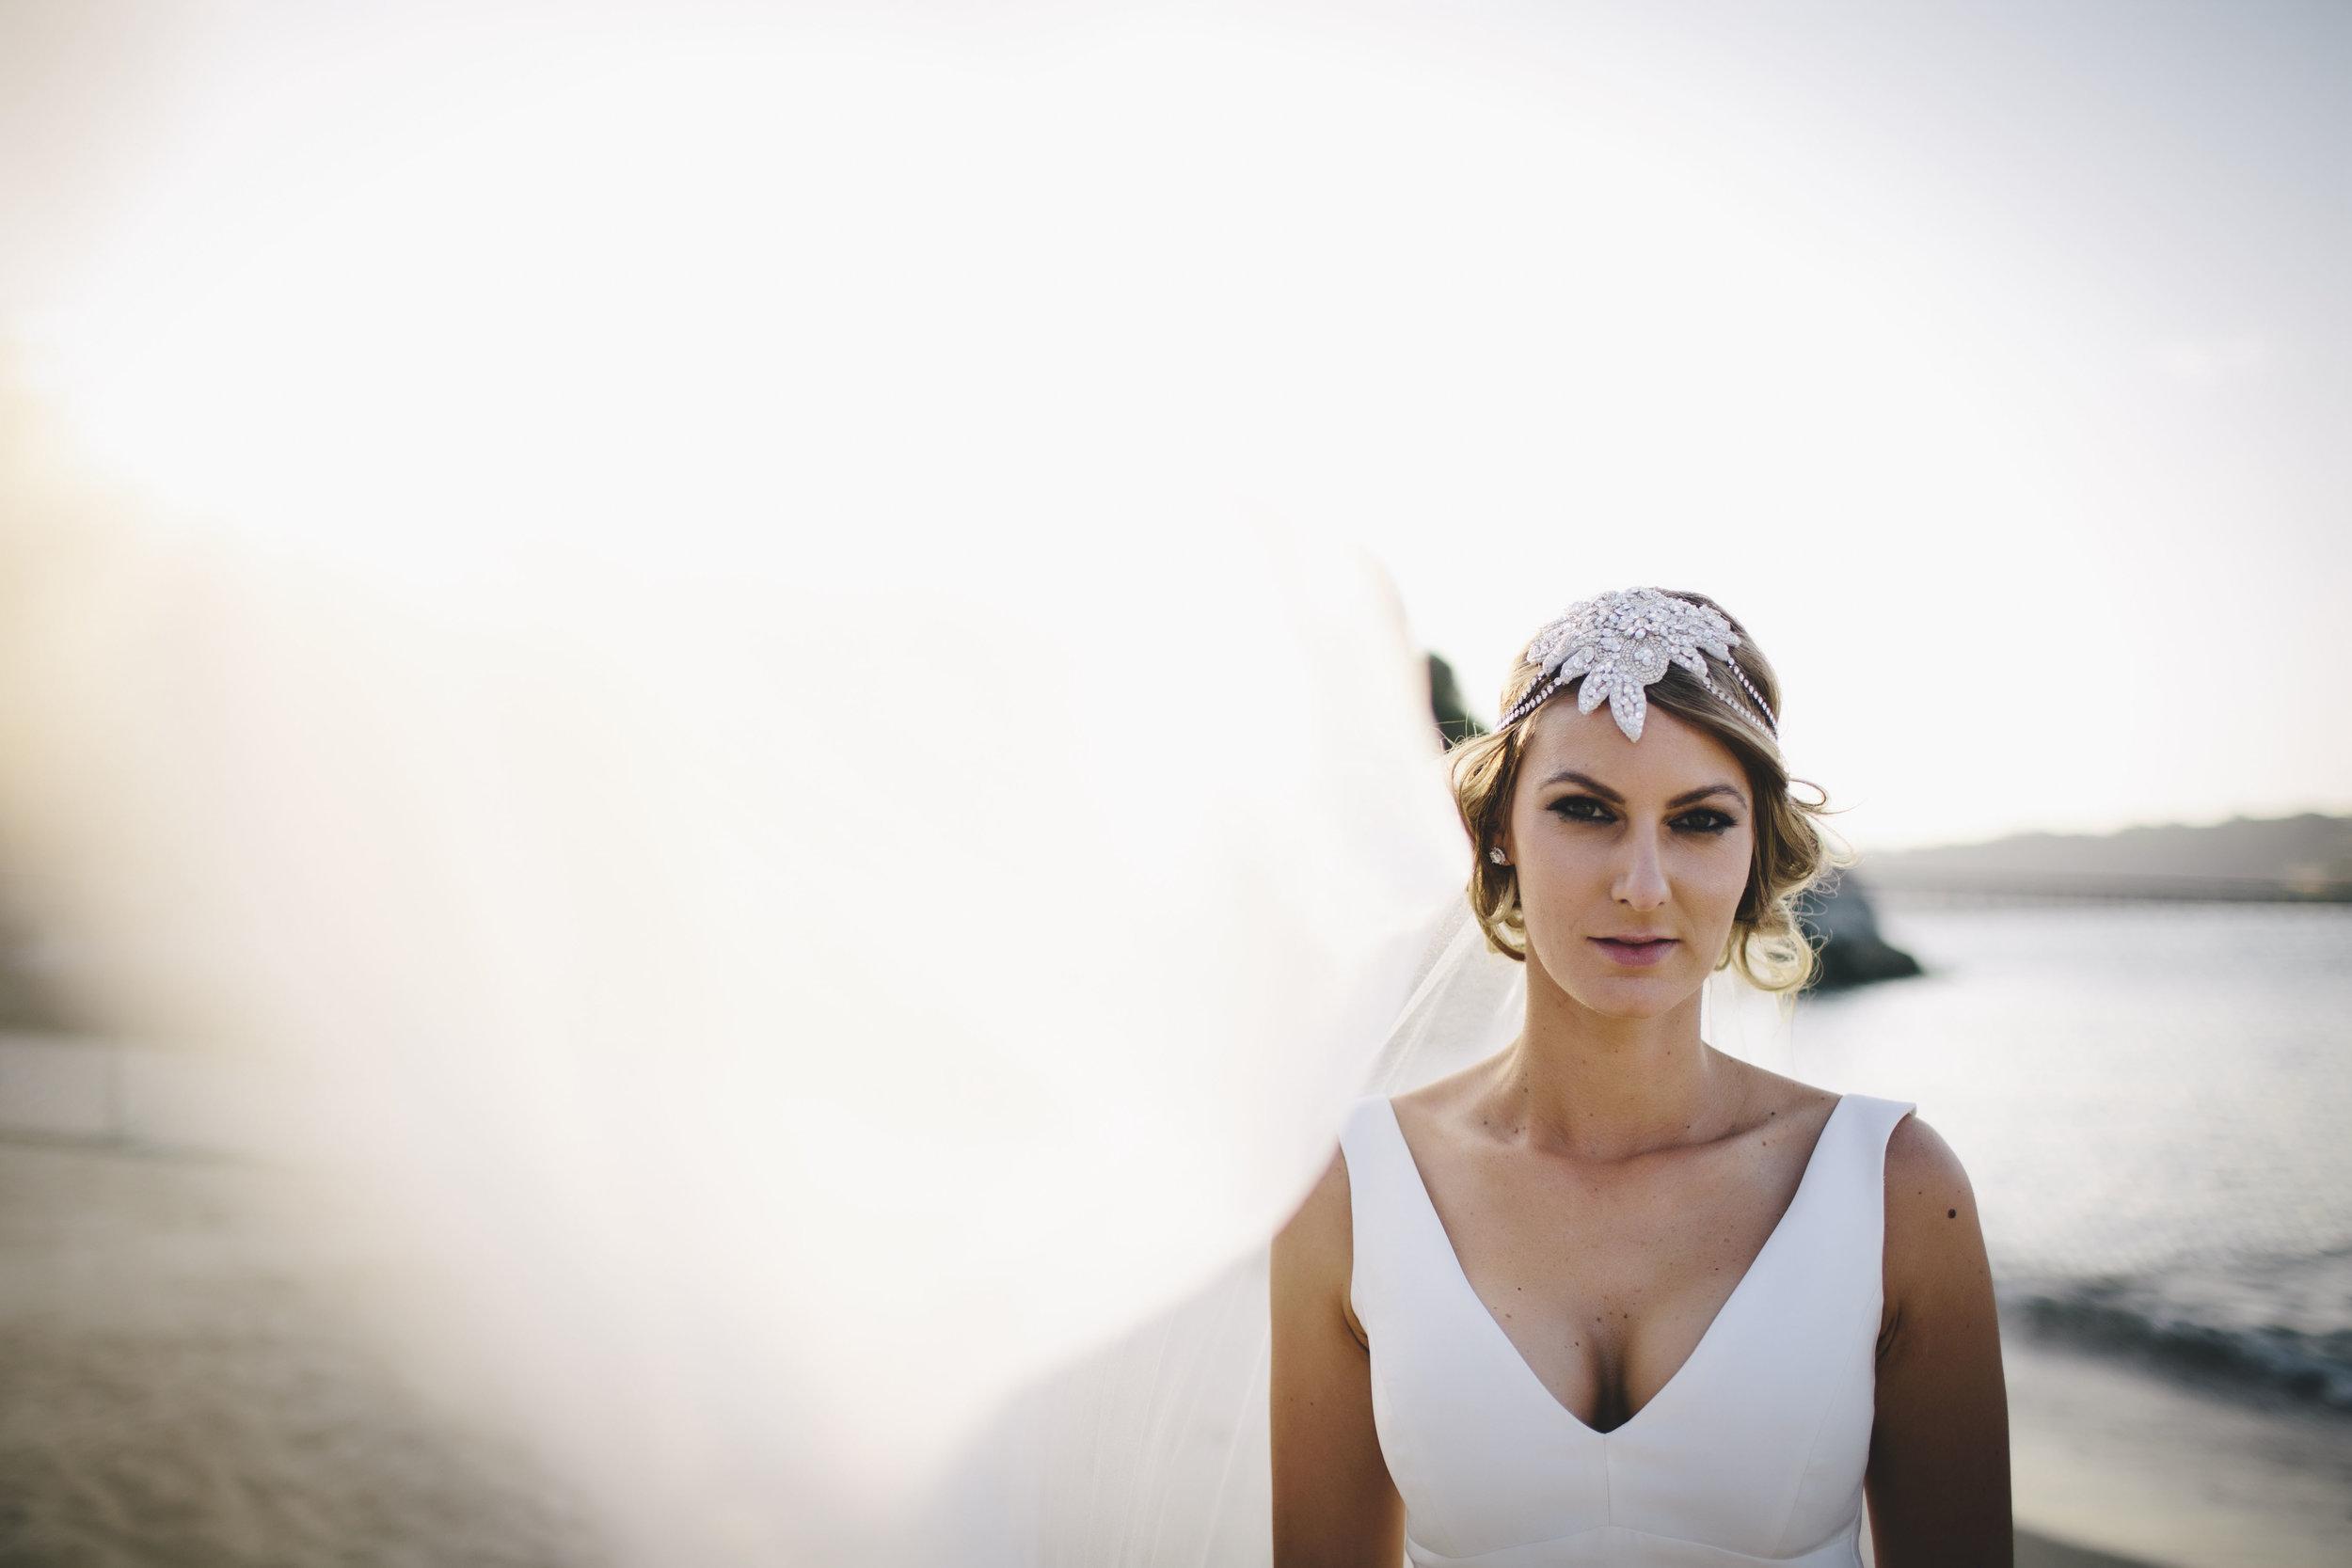 leichardt_greek_orthodox_church_zest_wedding.056.jpg